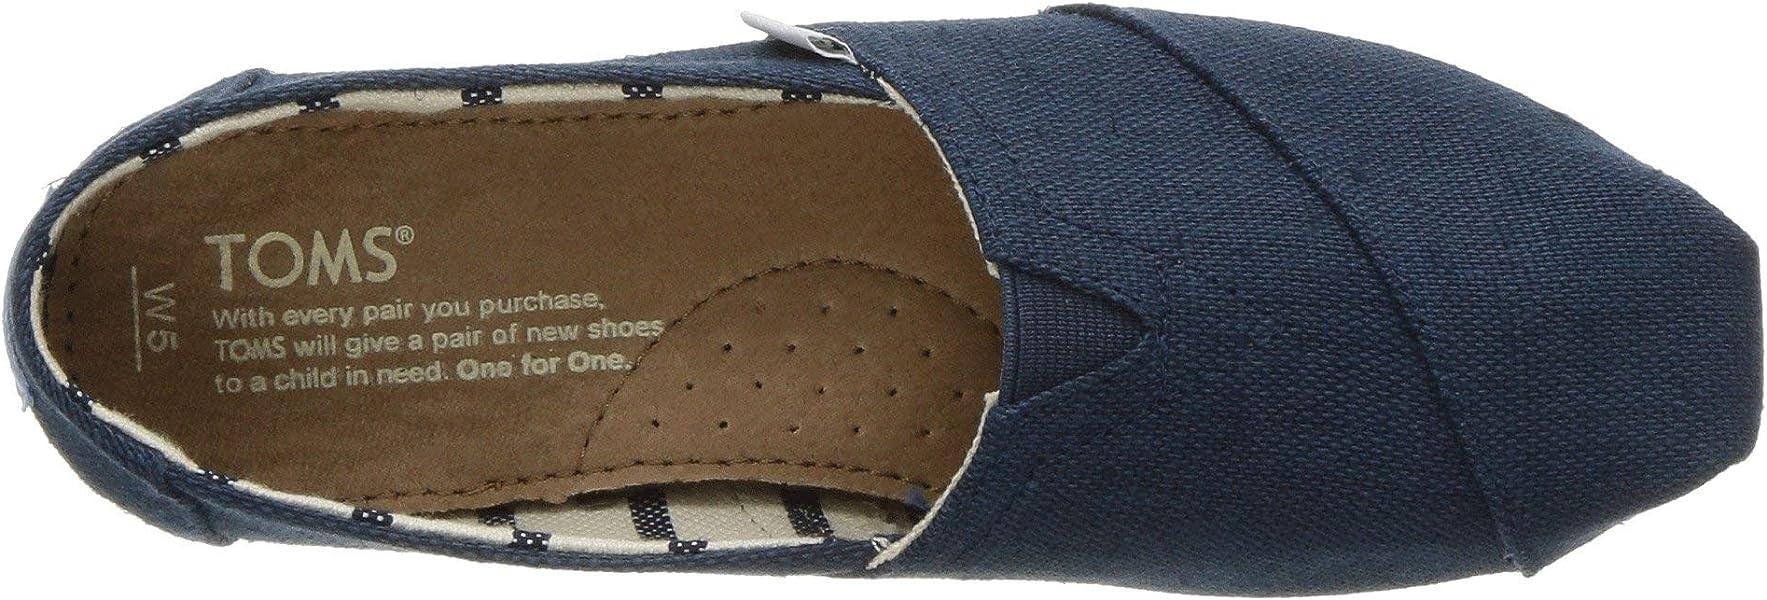 Shoes Size 7 5 Majolic Classic Women's Blue Heritage Canvas F5uKTl1Jc3